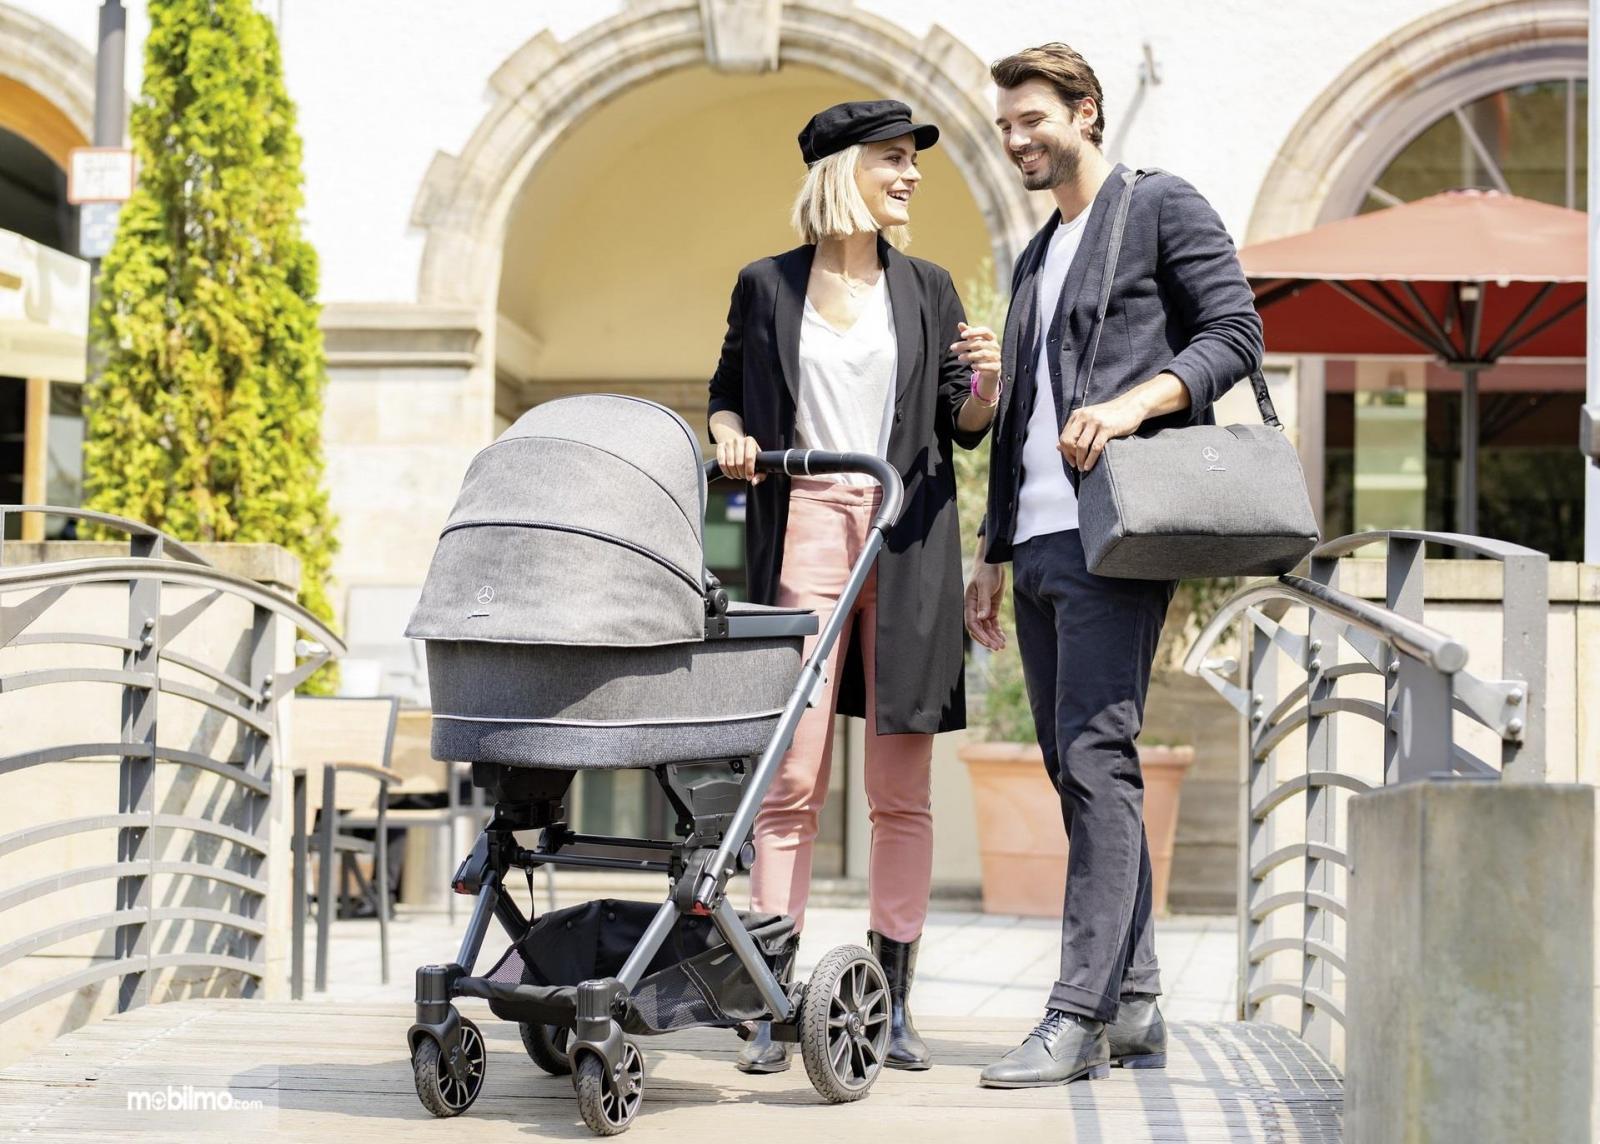 Gambar yang menunjukan pasangan dengan strolley Mercedes